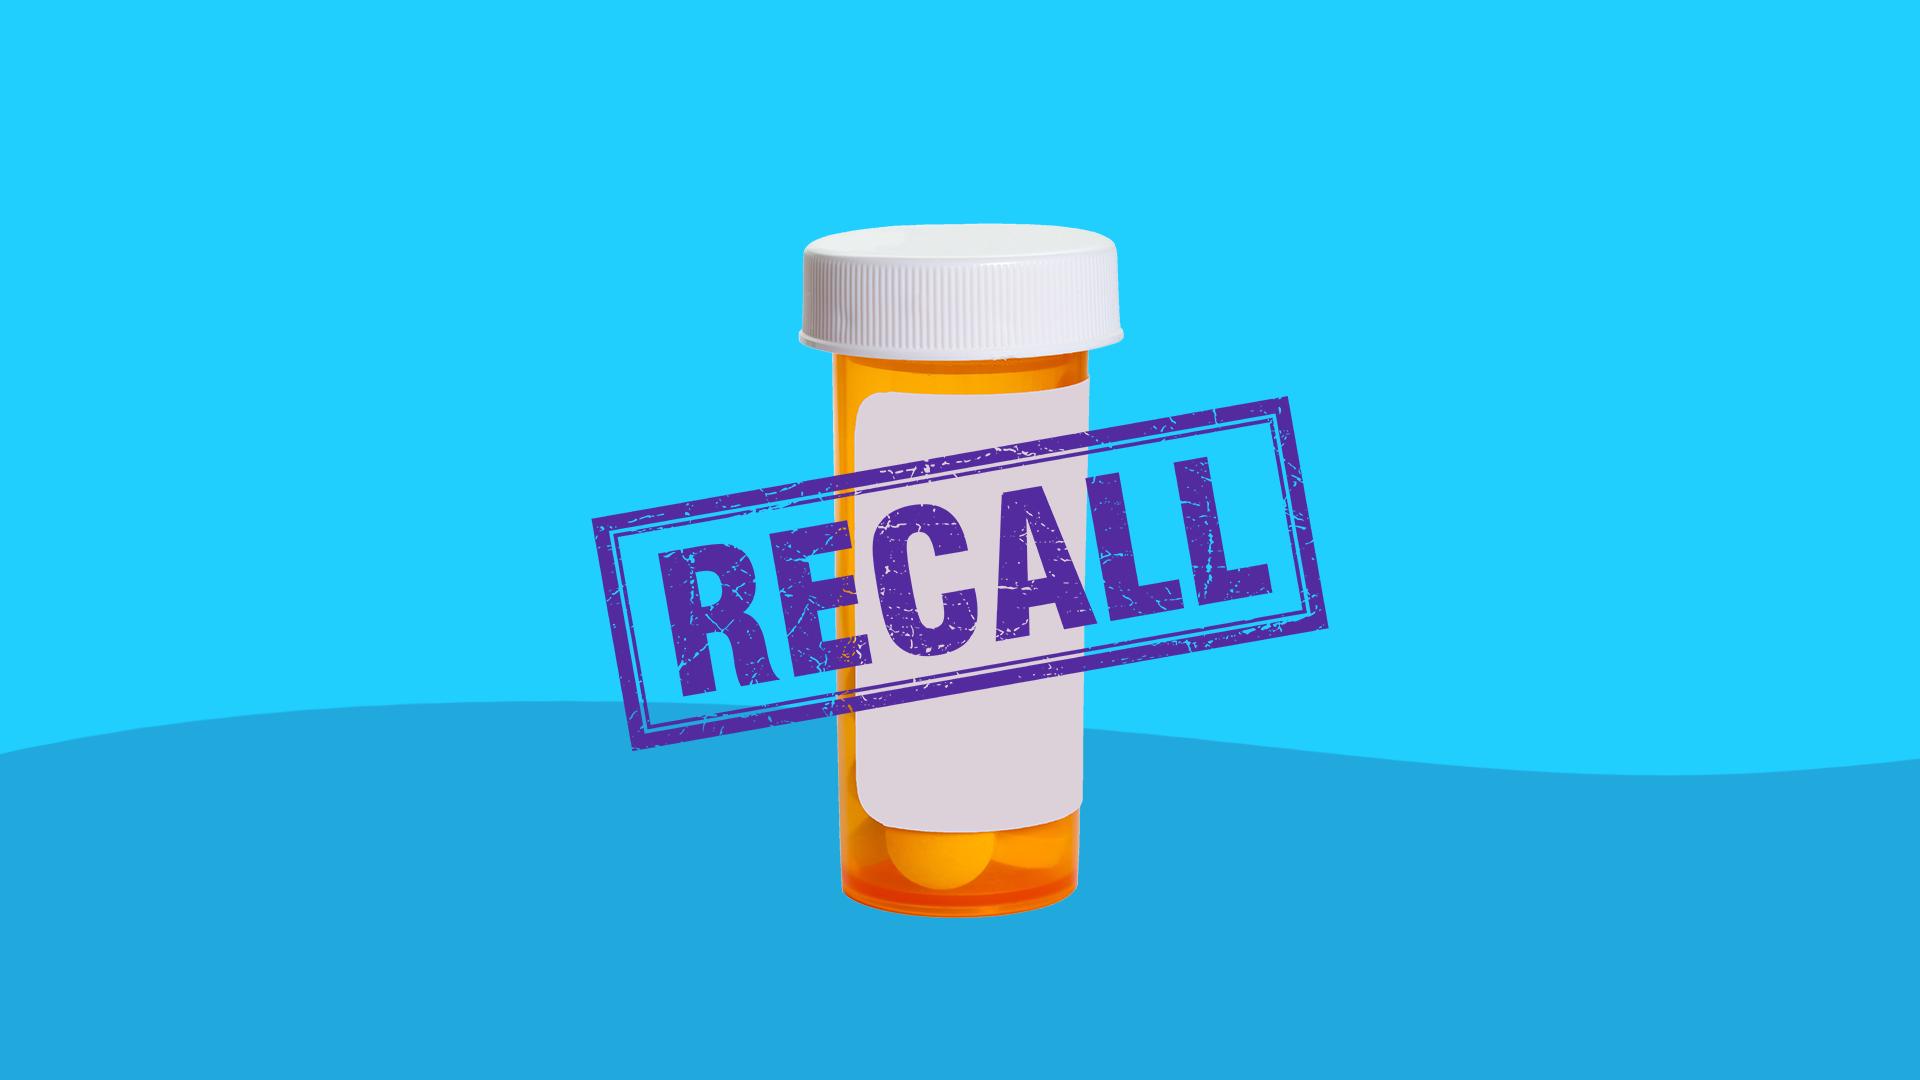 Pfizer issues voluntary recall of Chantix